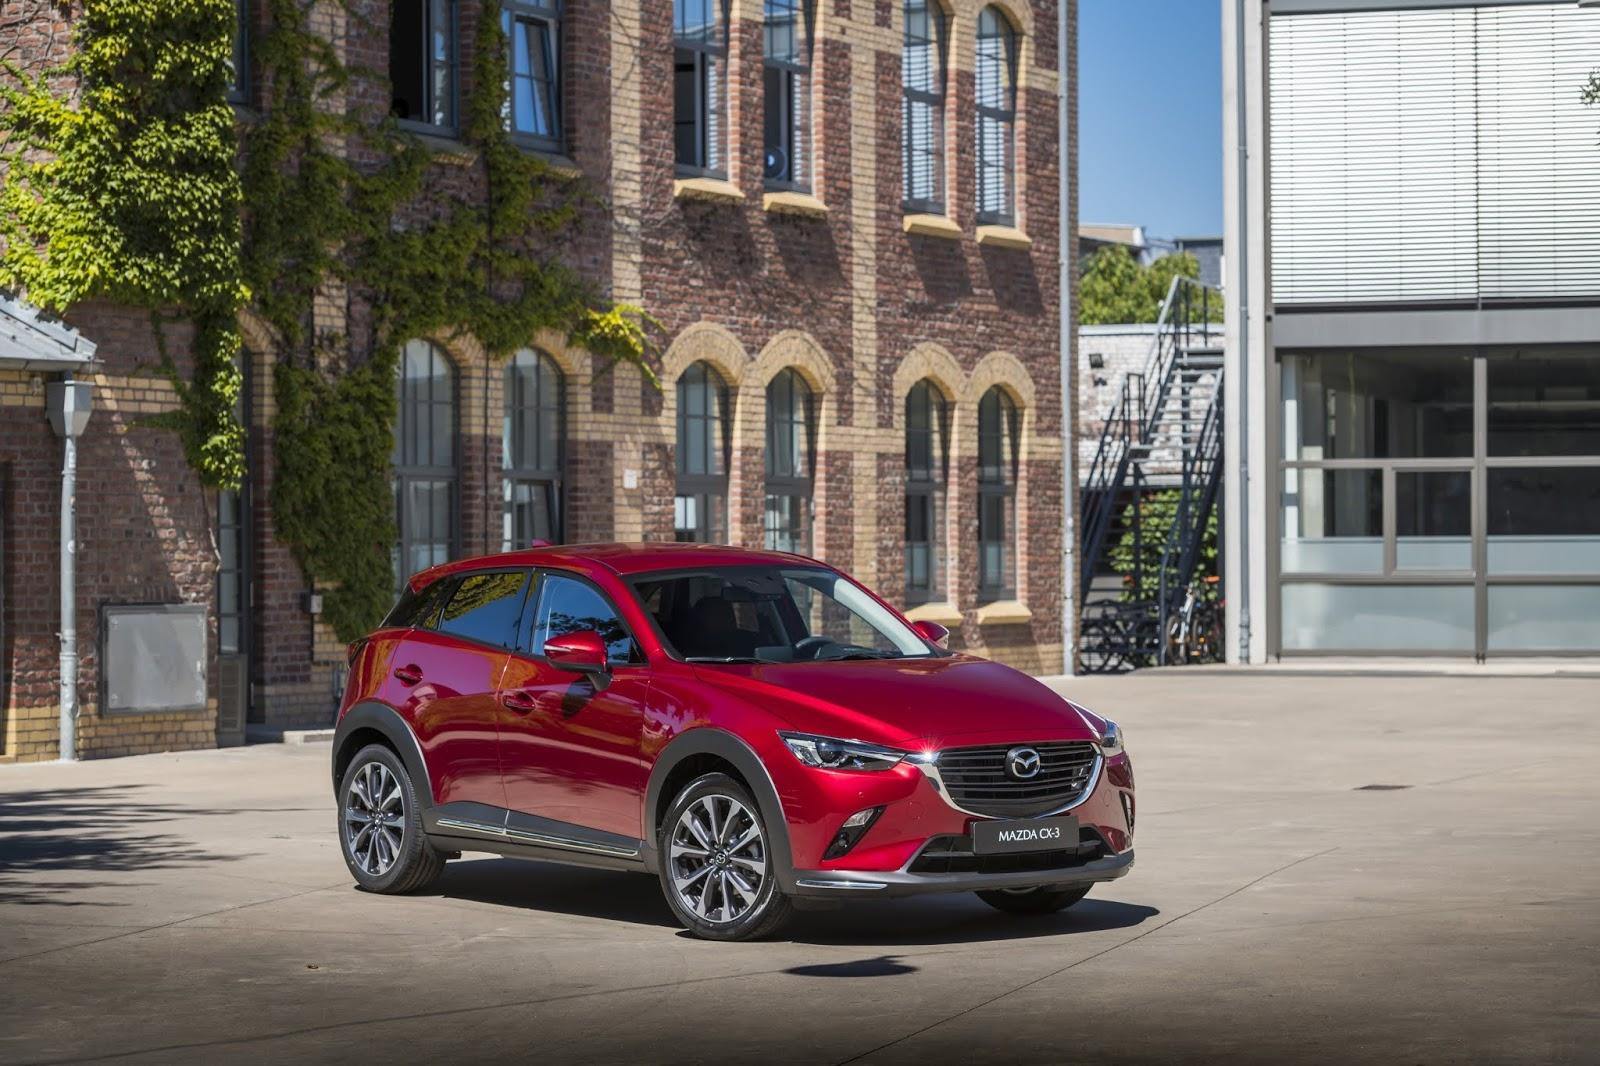 2021 Mazda Cx 3 Release Date and Concept